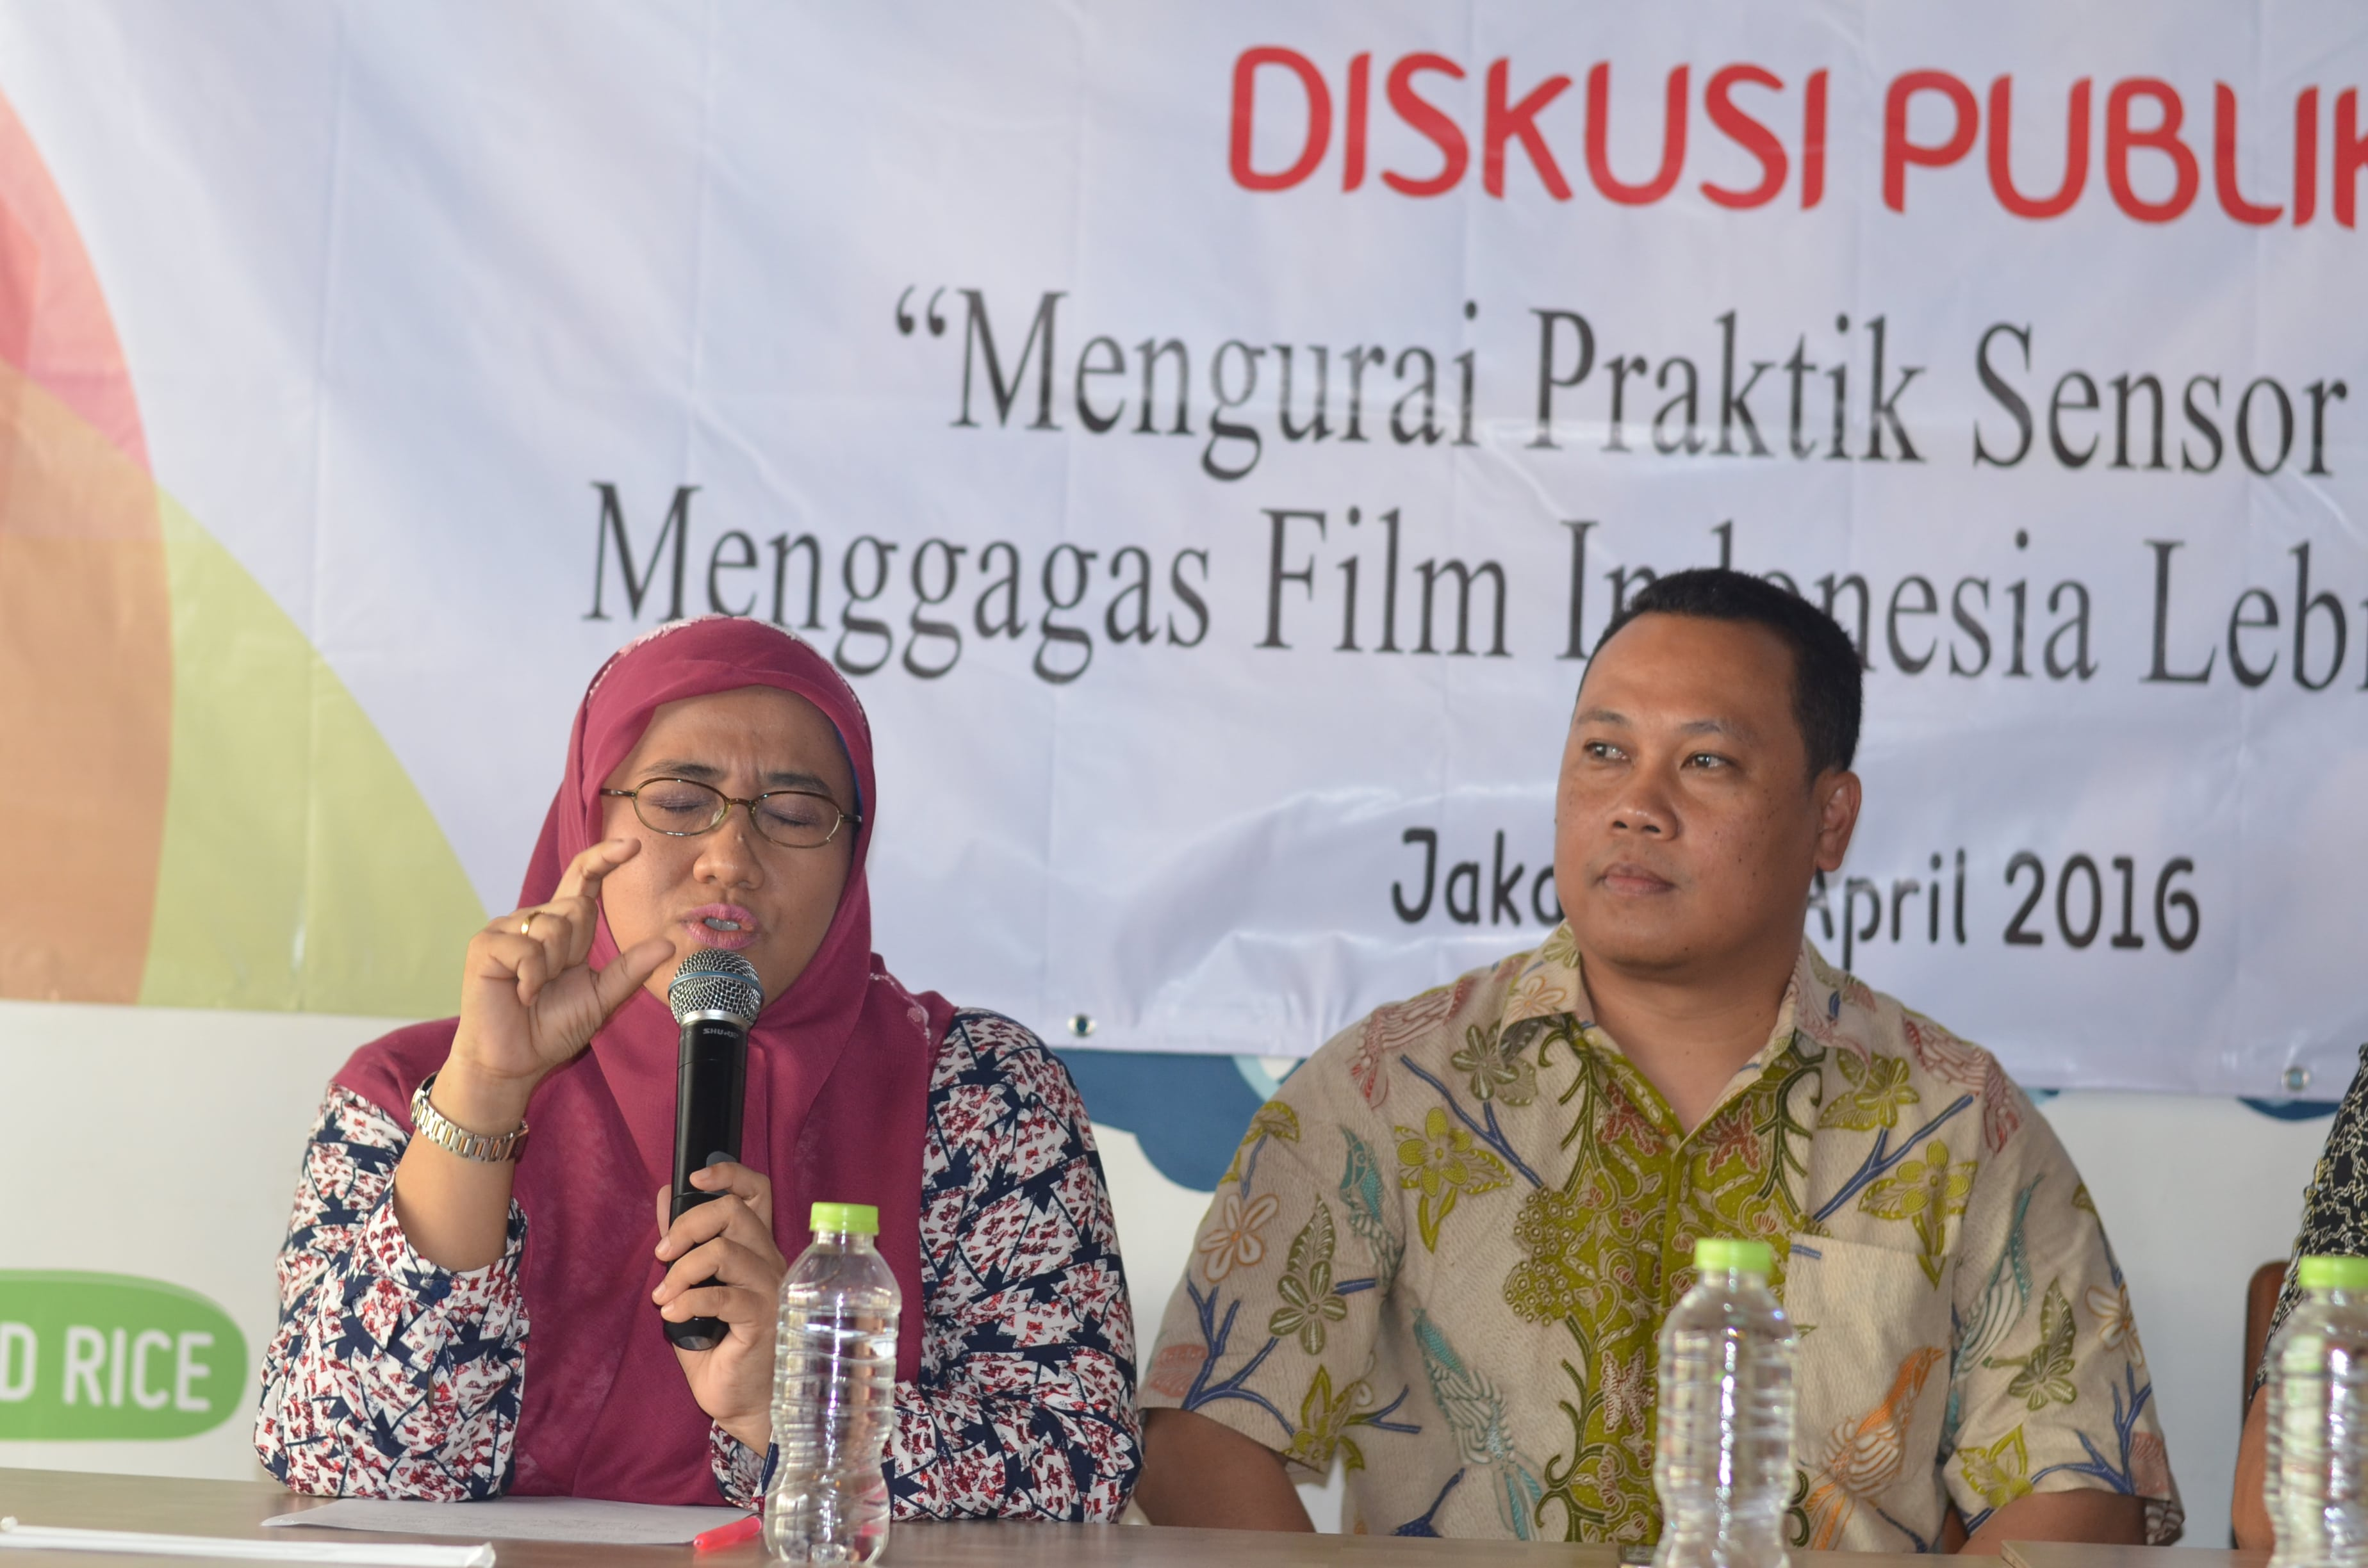 Dari kiri ke kanan: Maria Advianti ( Komisioner Komisi Perlindungan Anak Indonesia/ KPAI) dan Rommy Fibri (Komisioner Lembaga Sensor Film/LSF)